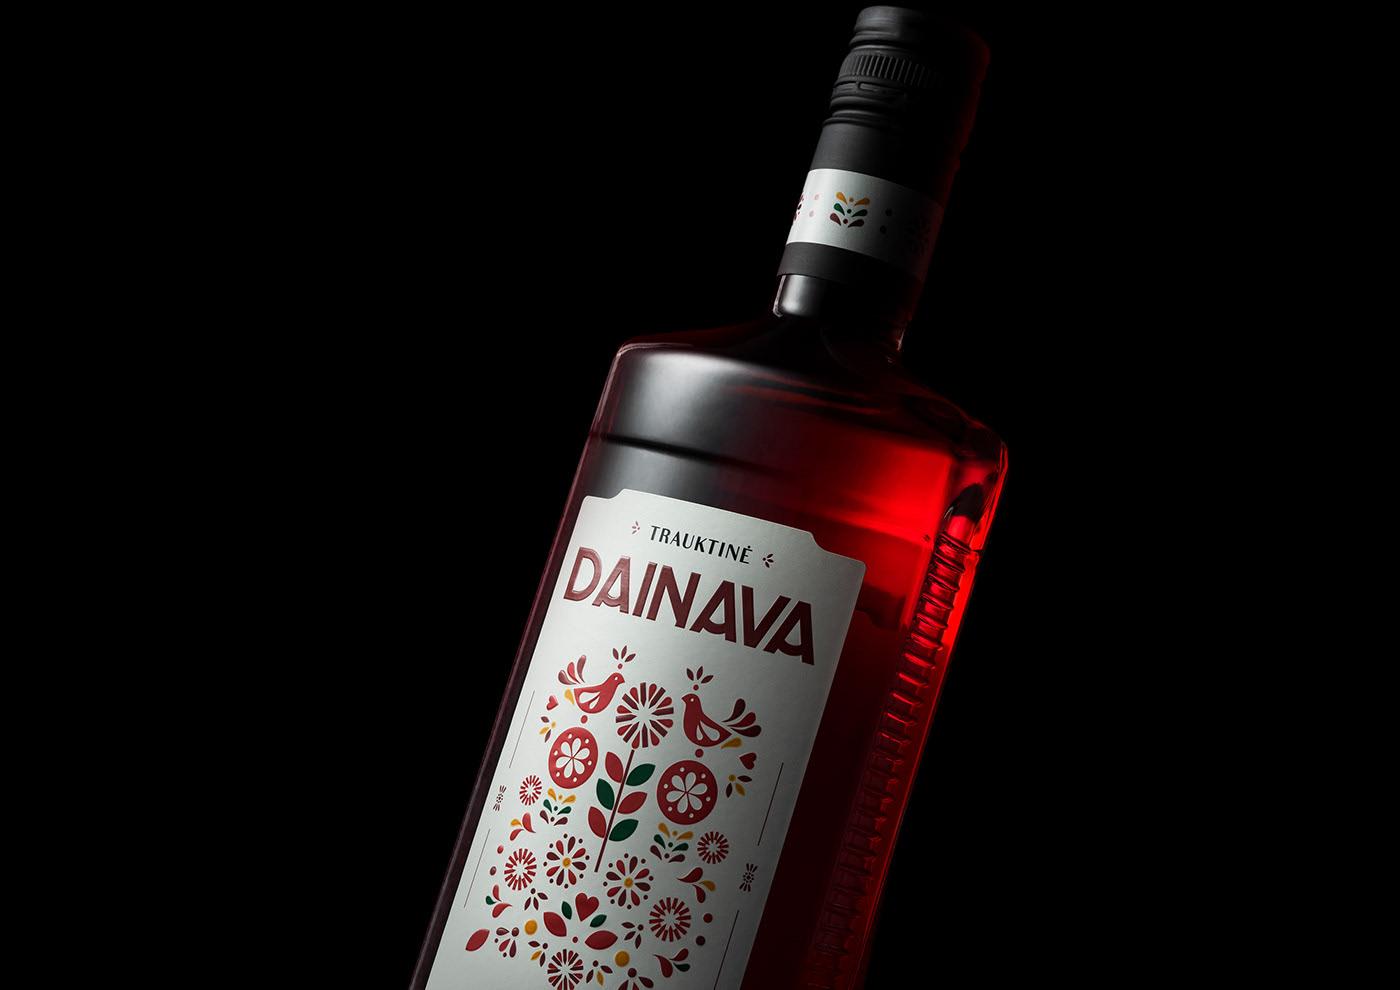 DAINAVA TRAUKTINE 葡萄酒包装设计